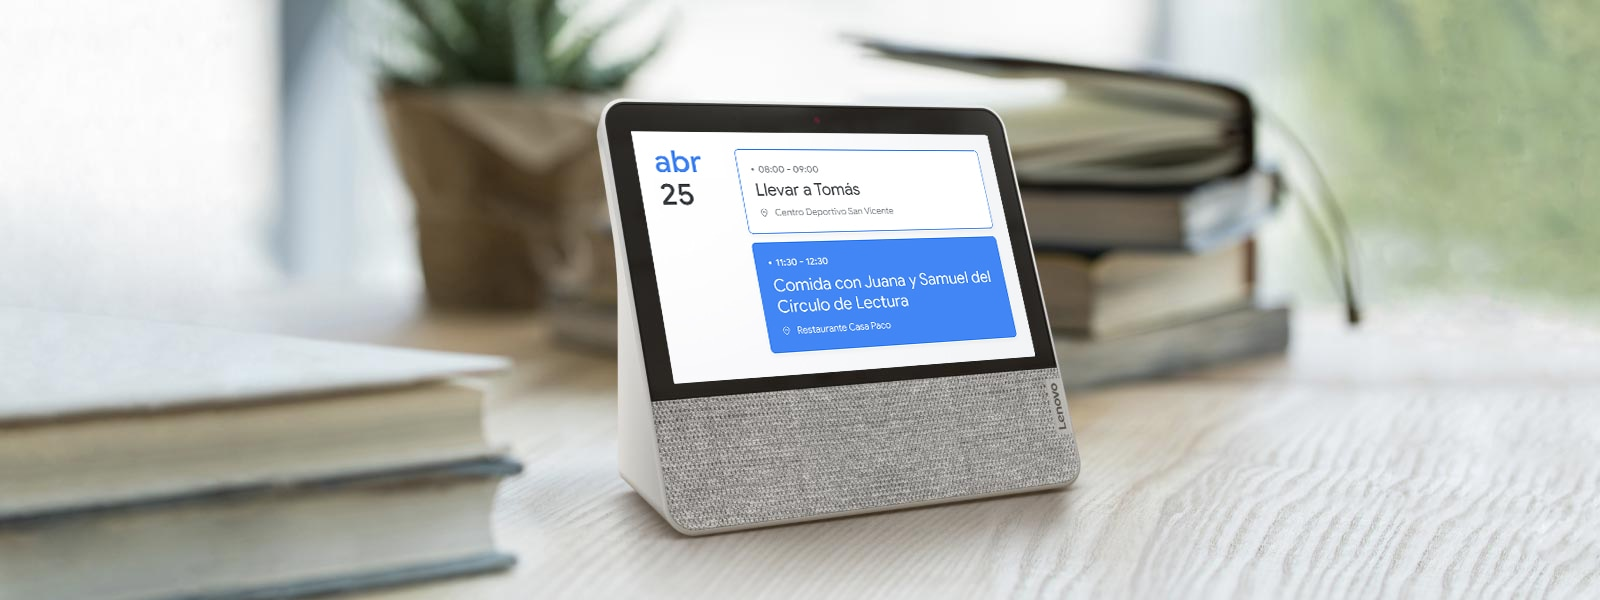 Lenovo Smart Display de 7 pulgadas te ayuda a gestionar tu agenda diaria.